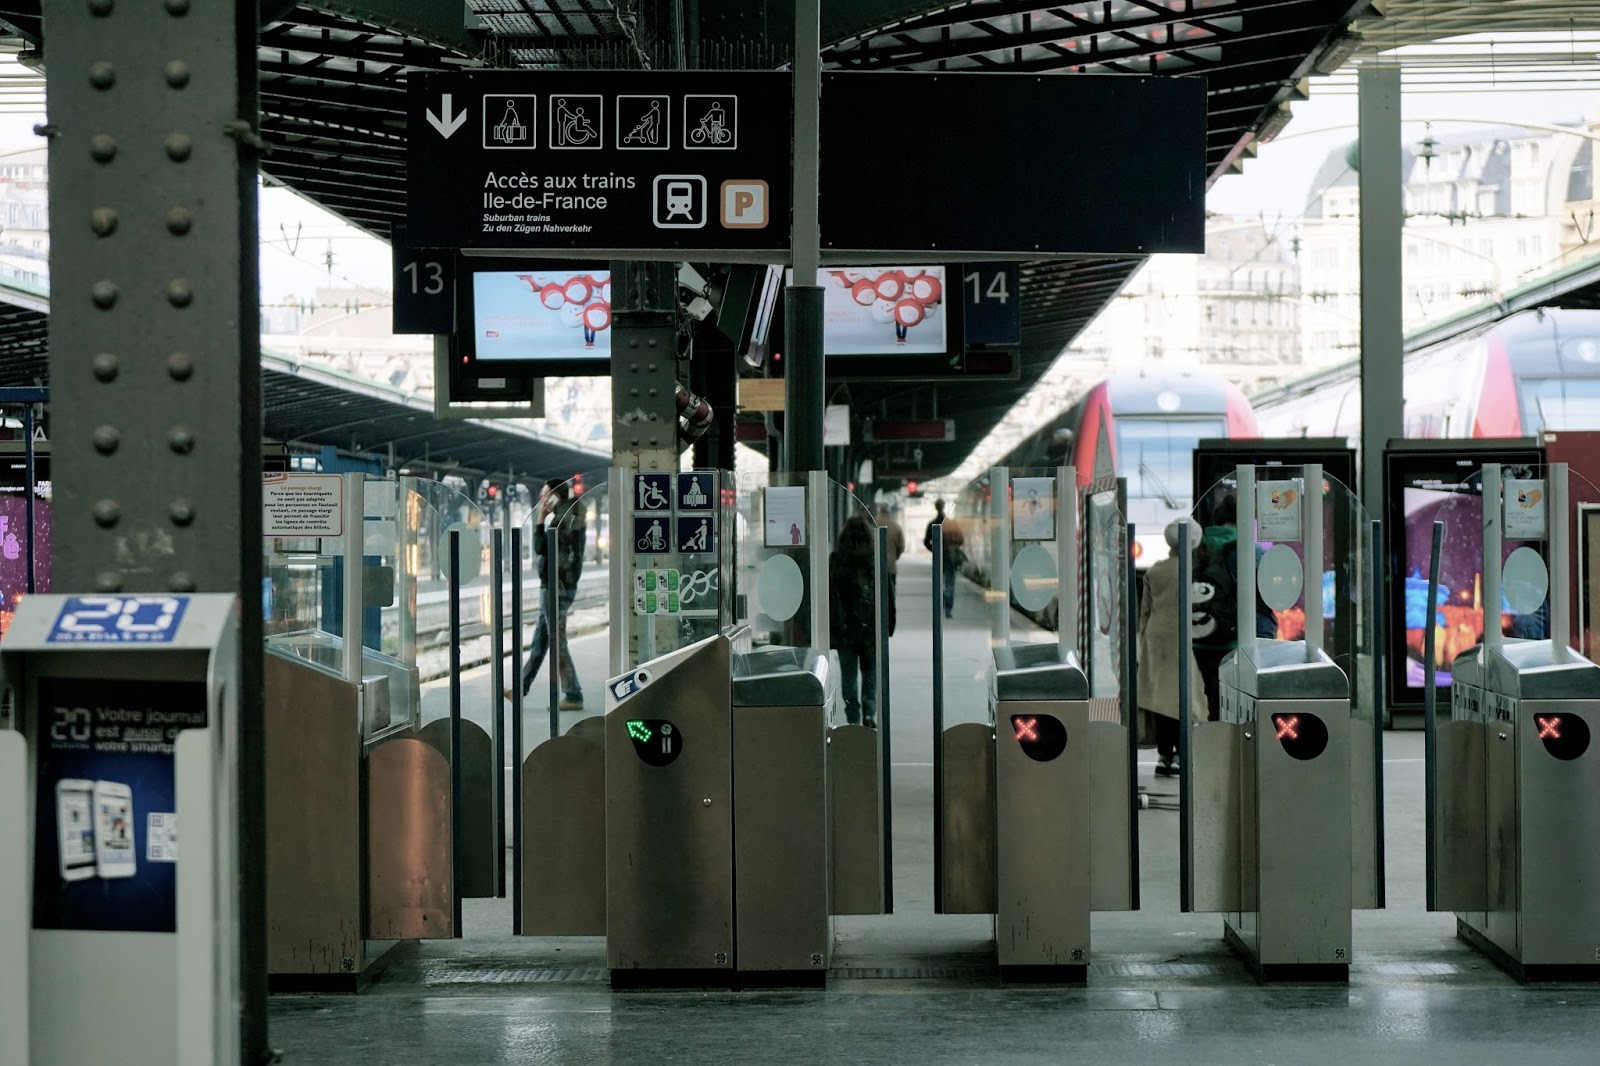 パリ東駅(Gare de l'Est)